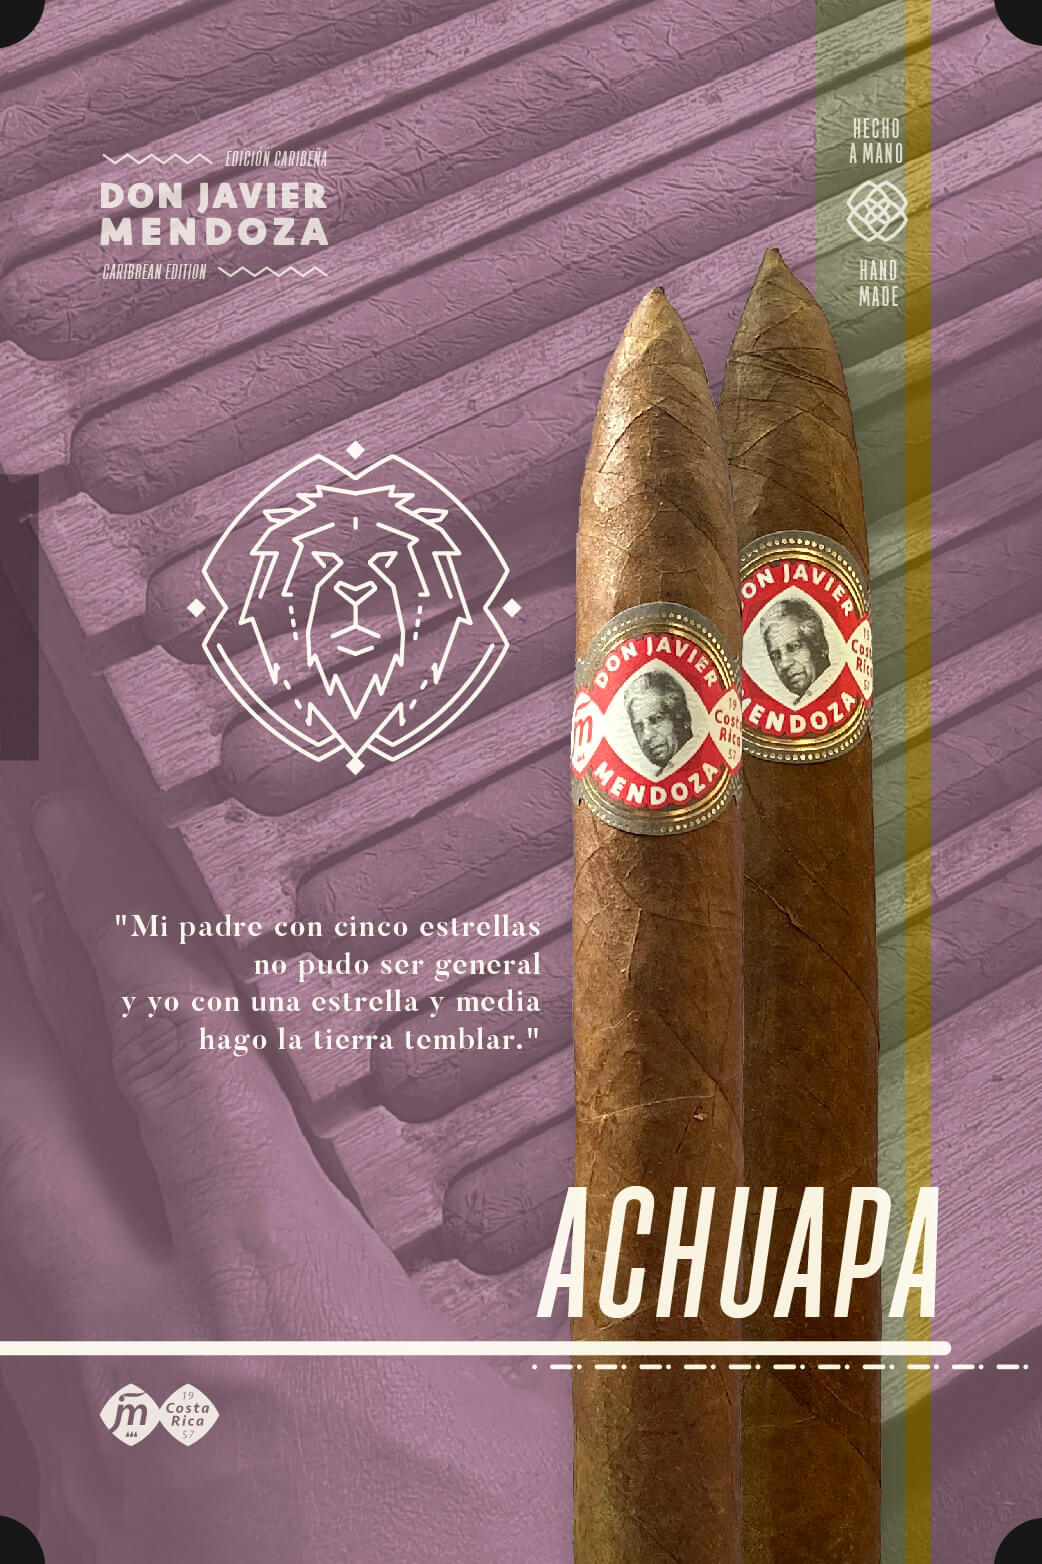 Don Javier Mendoza Achuapa